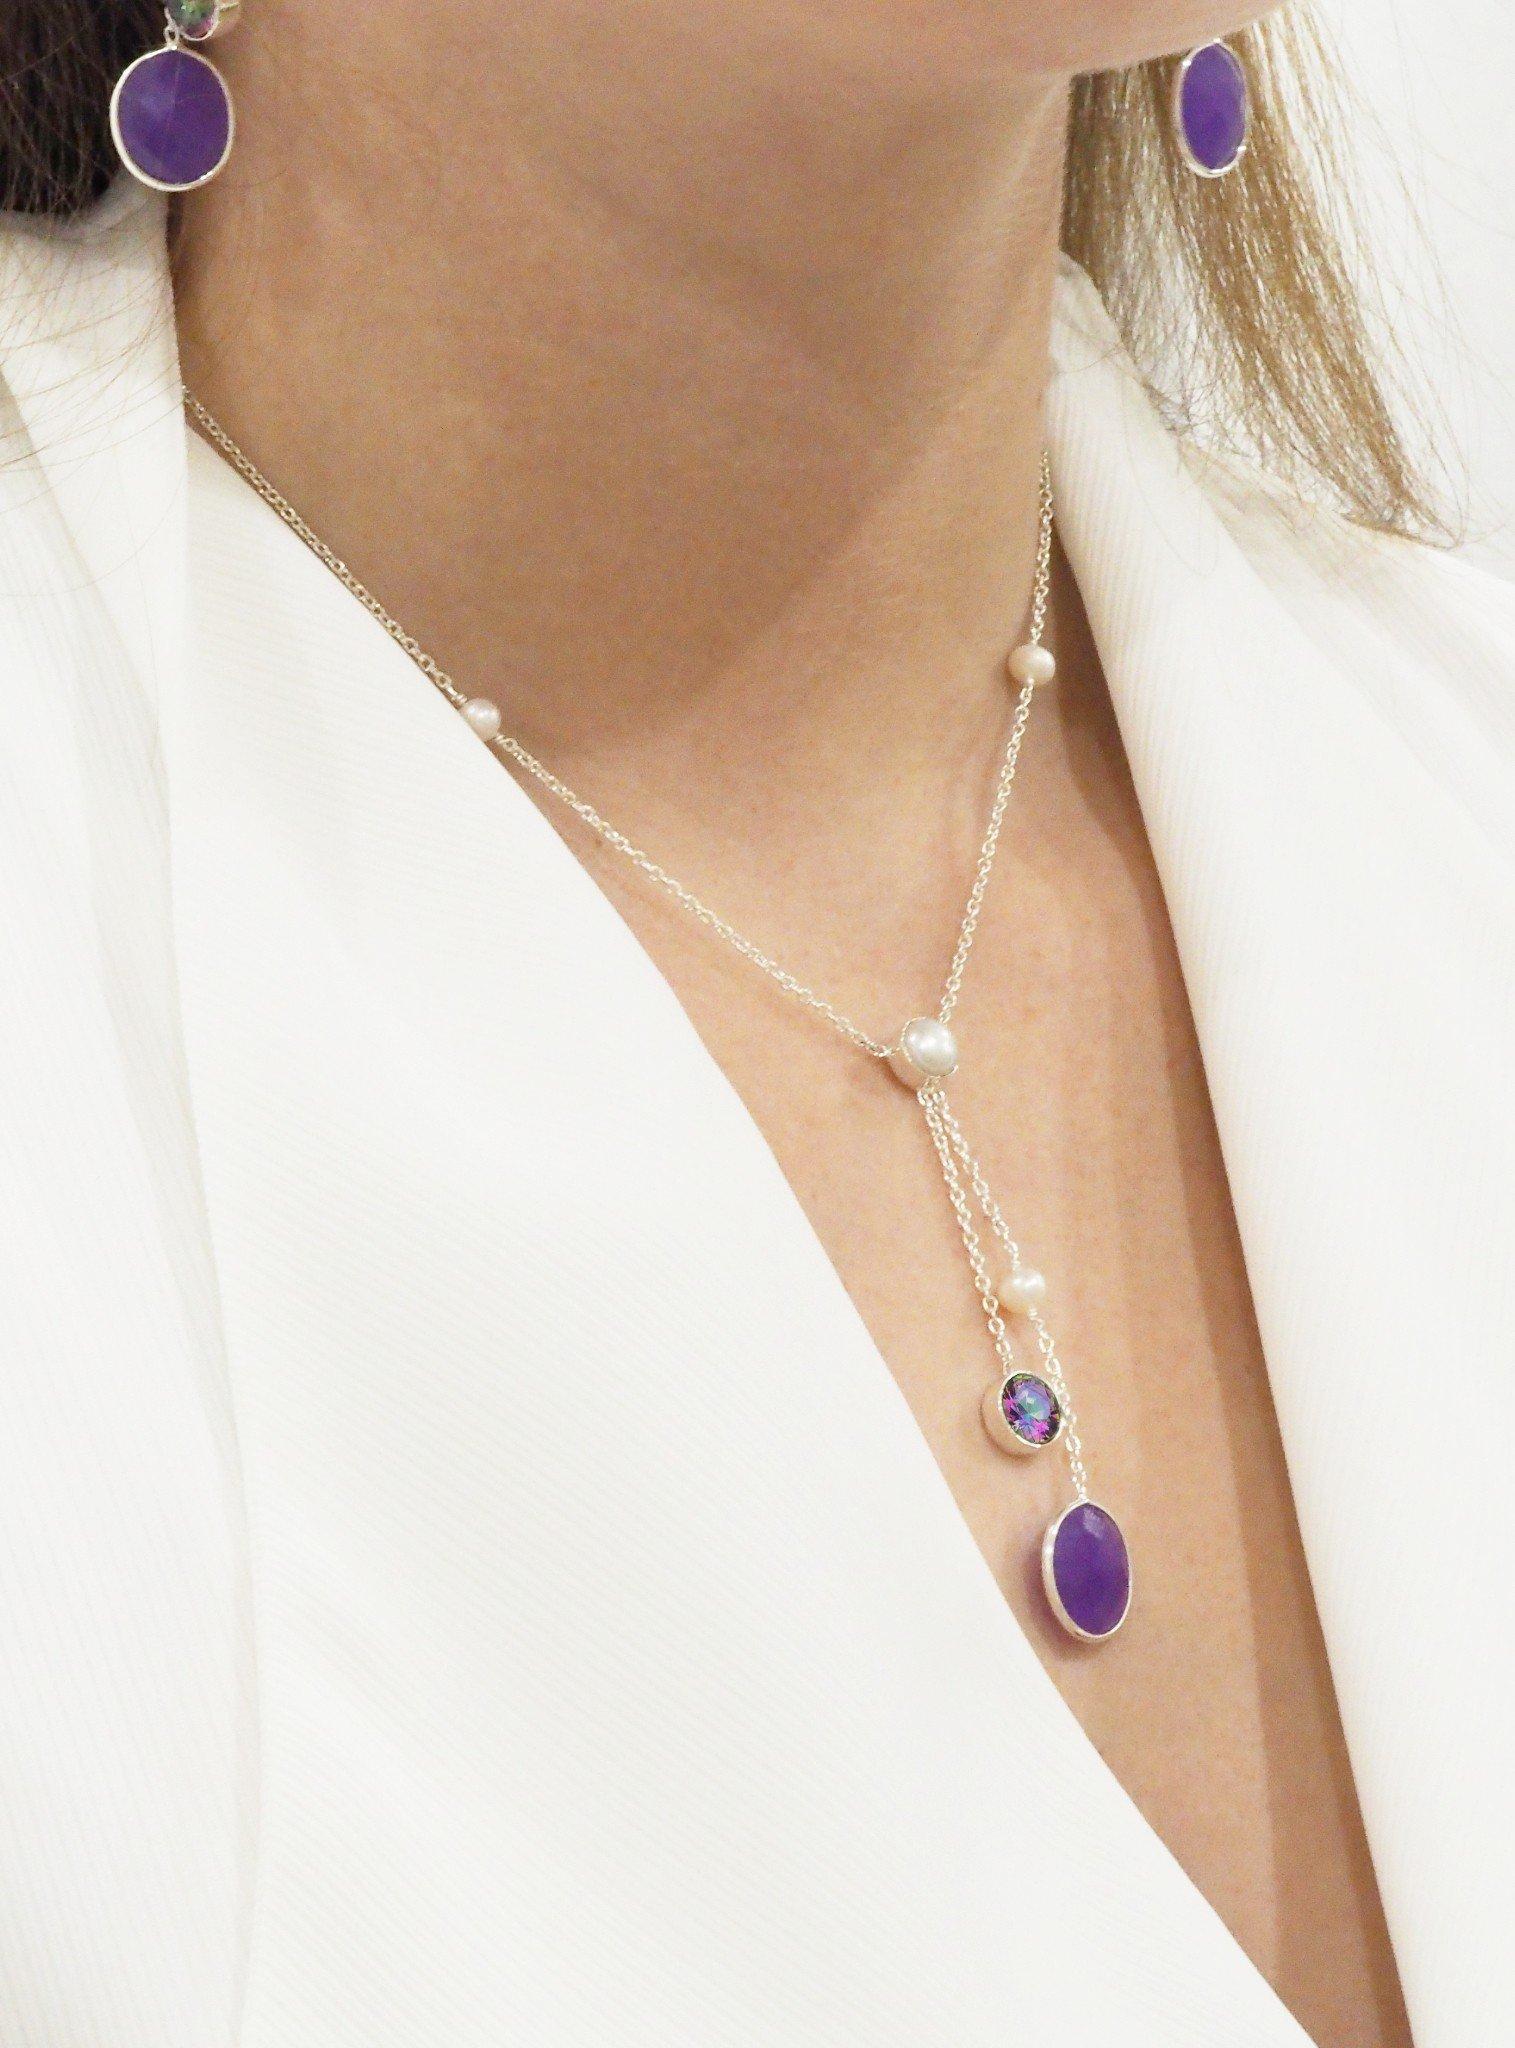 Clarke Gemstone Necklace in Silver